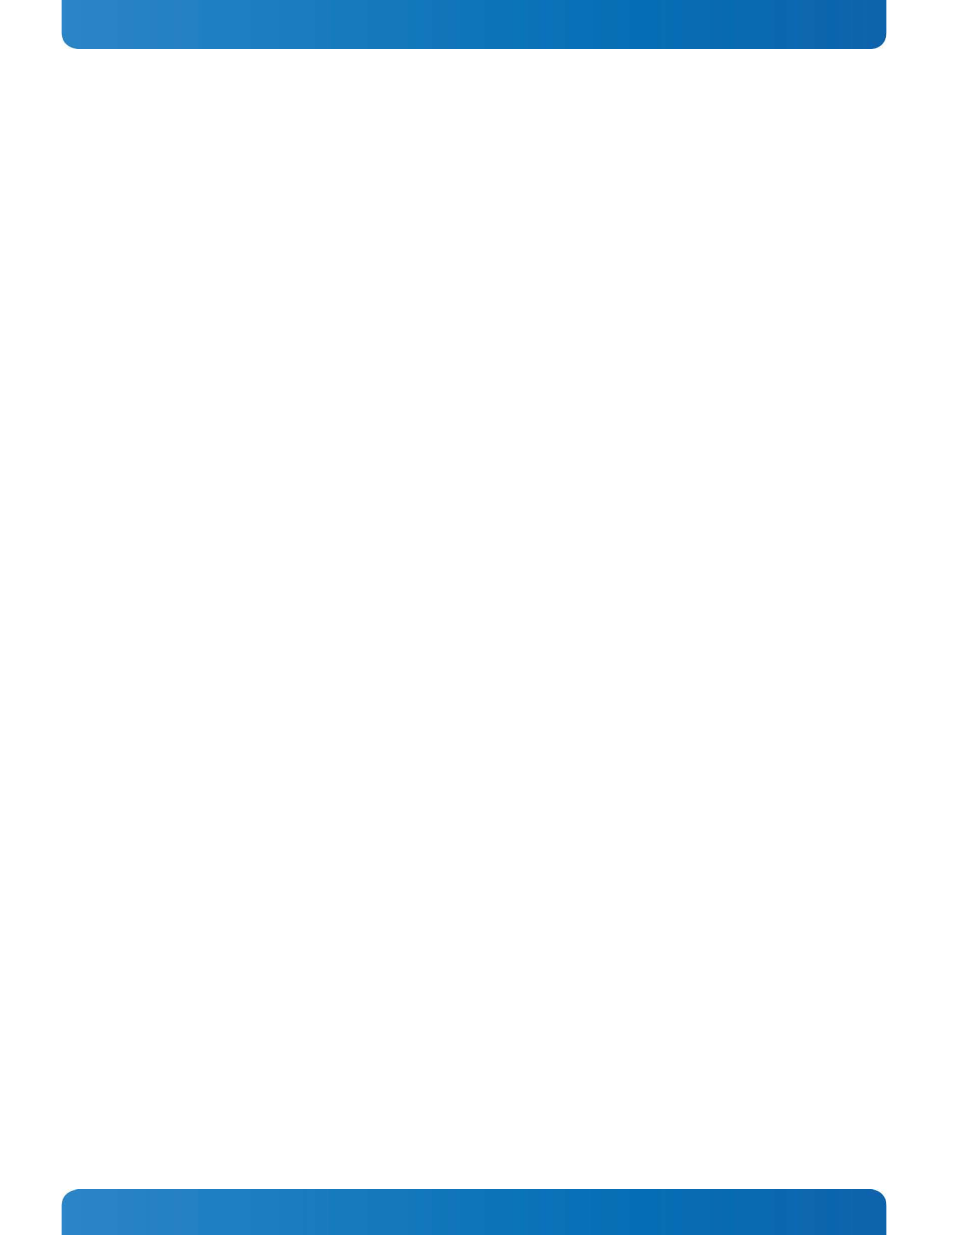 2 kontron documents, 3 kontron schematics, 4 nvidia hardware